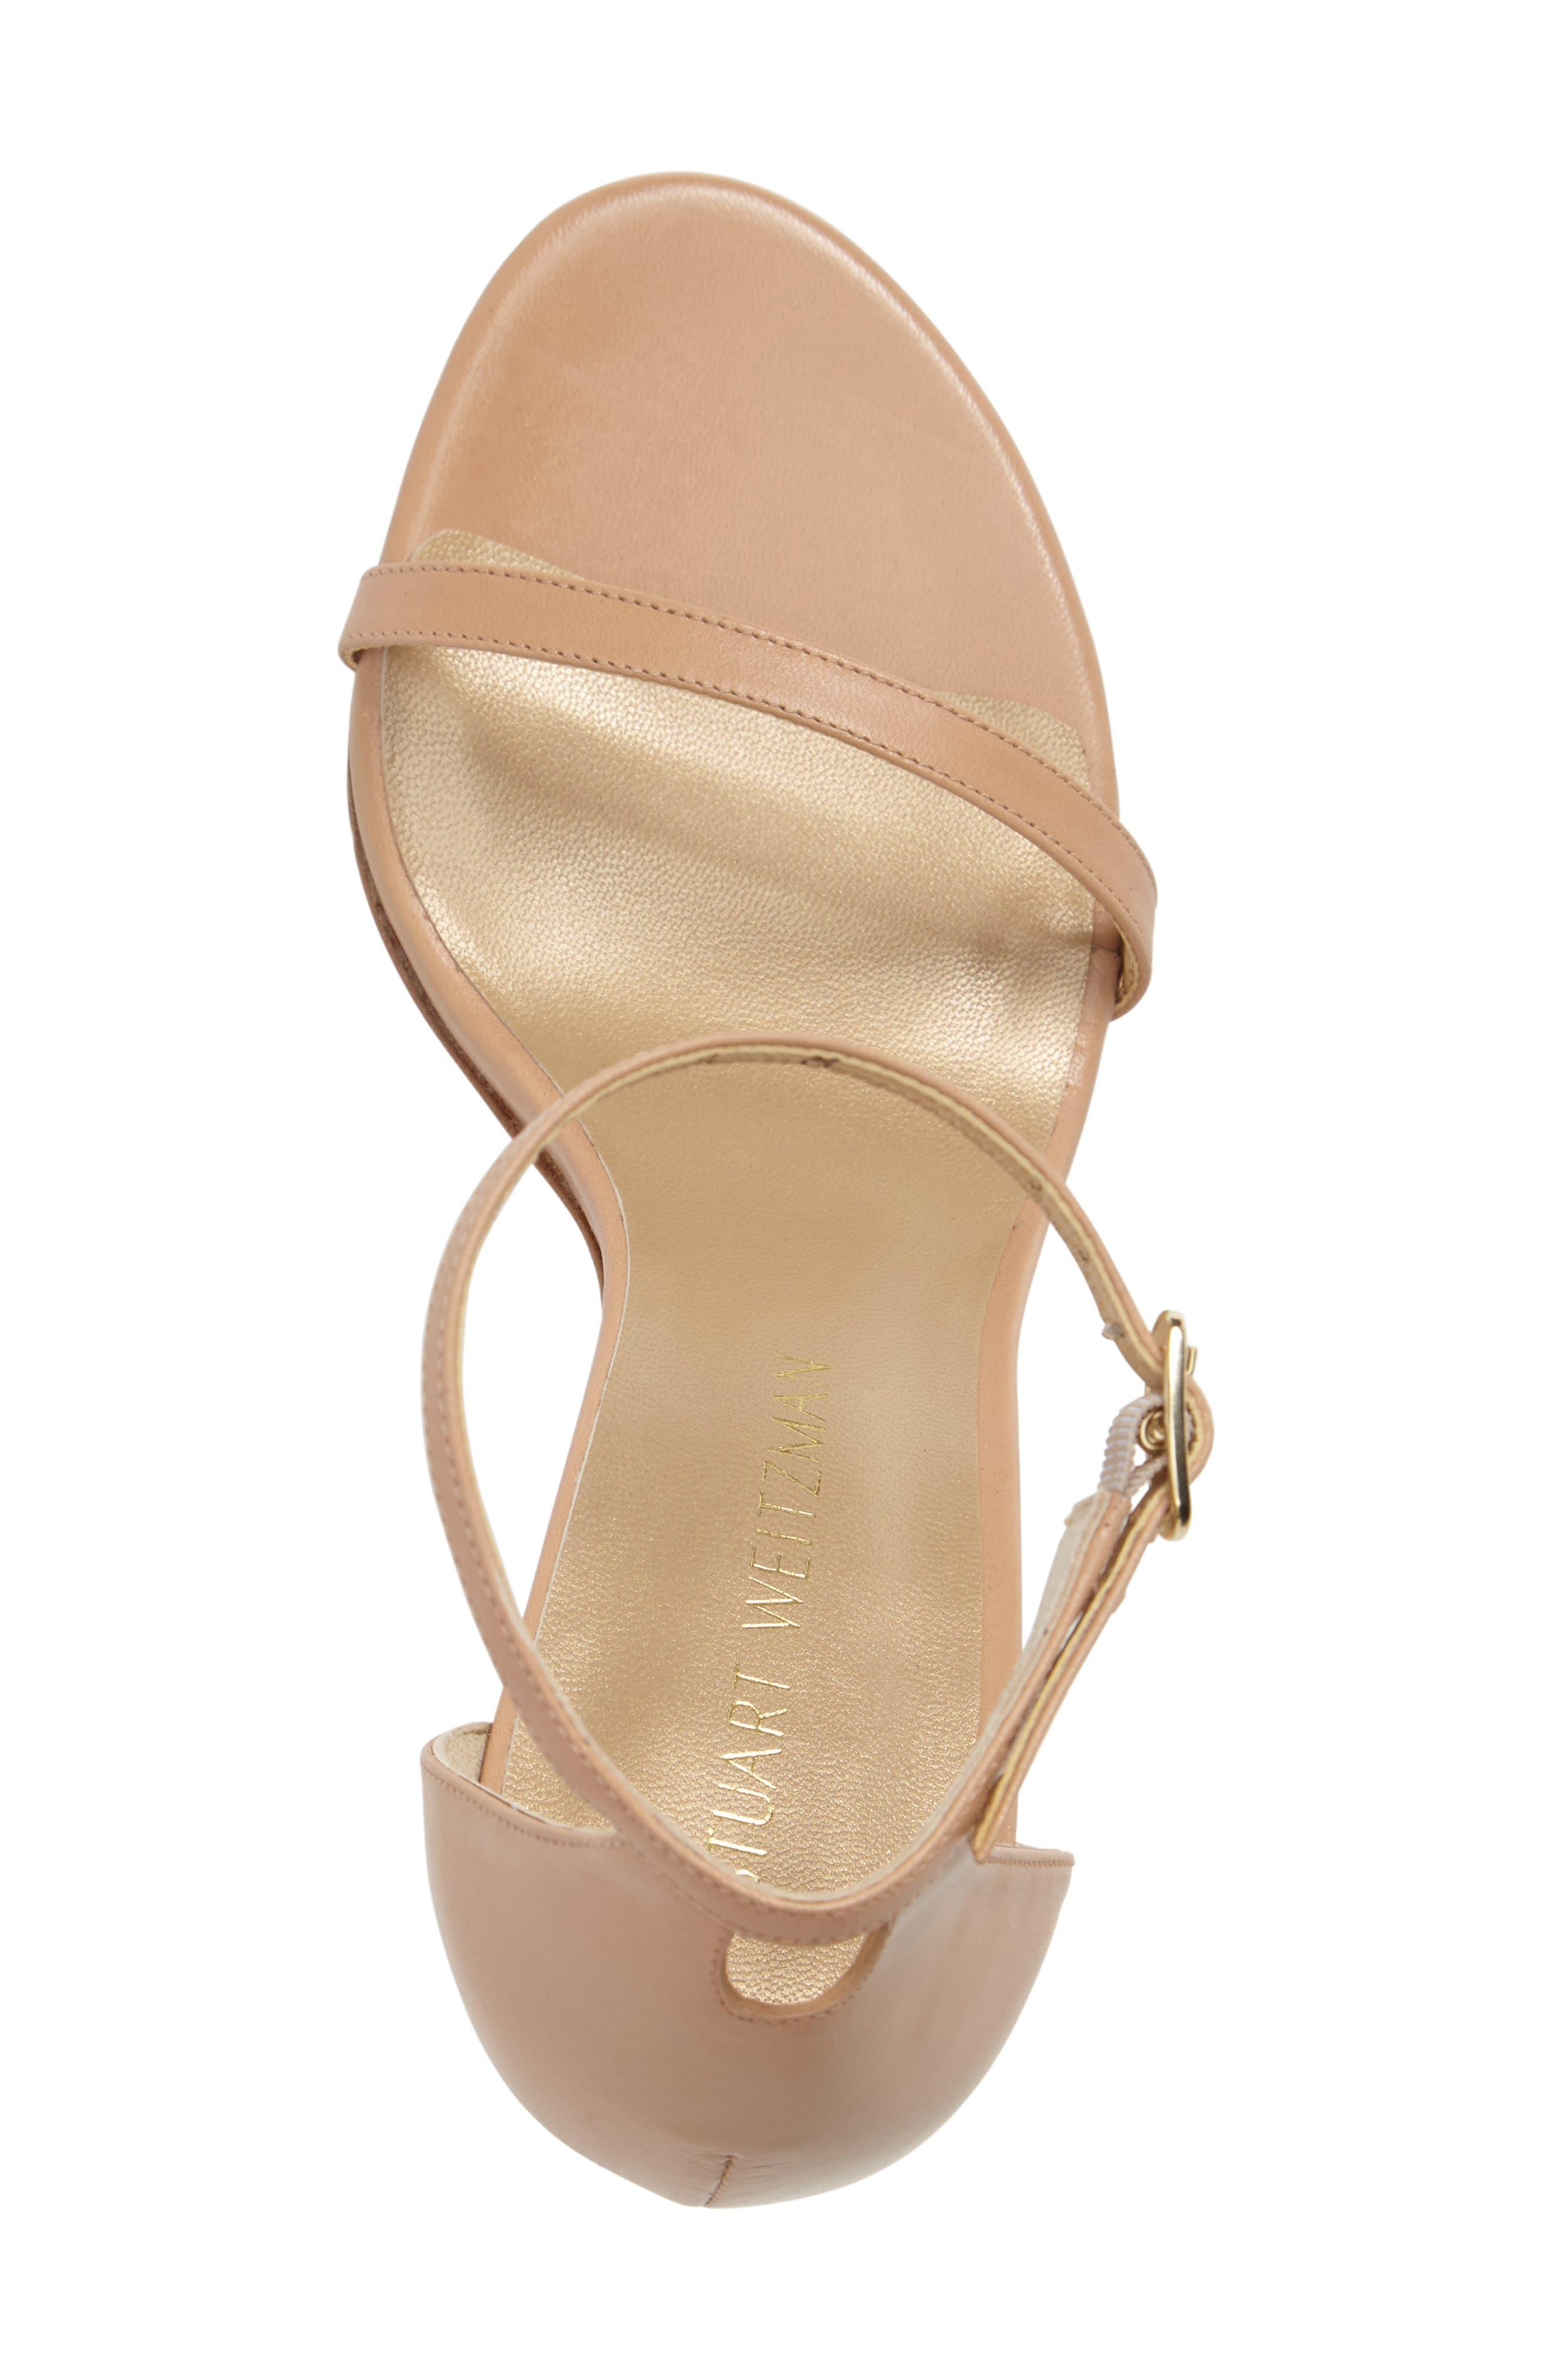 Nudistsong Ankle Strap Sandal,                             Alternate thumbnail 112, color,